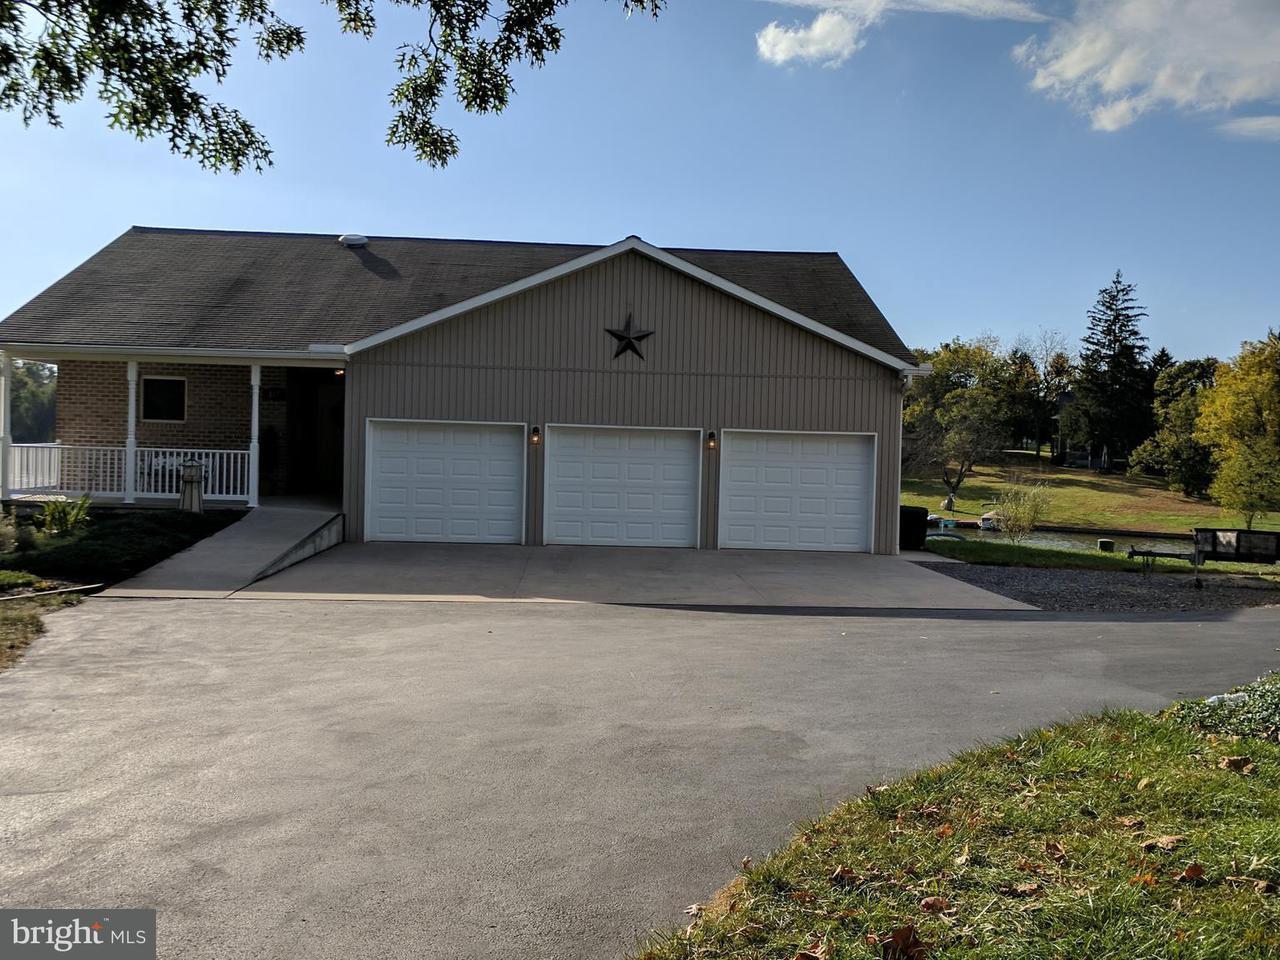 獨棟家庭住宅 為 出售 在 487 HERITAGE Drive 487 HERITAGE Drive Gettysburg, 賓夕法尼亞州 17325 美國